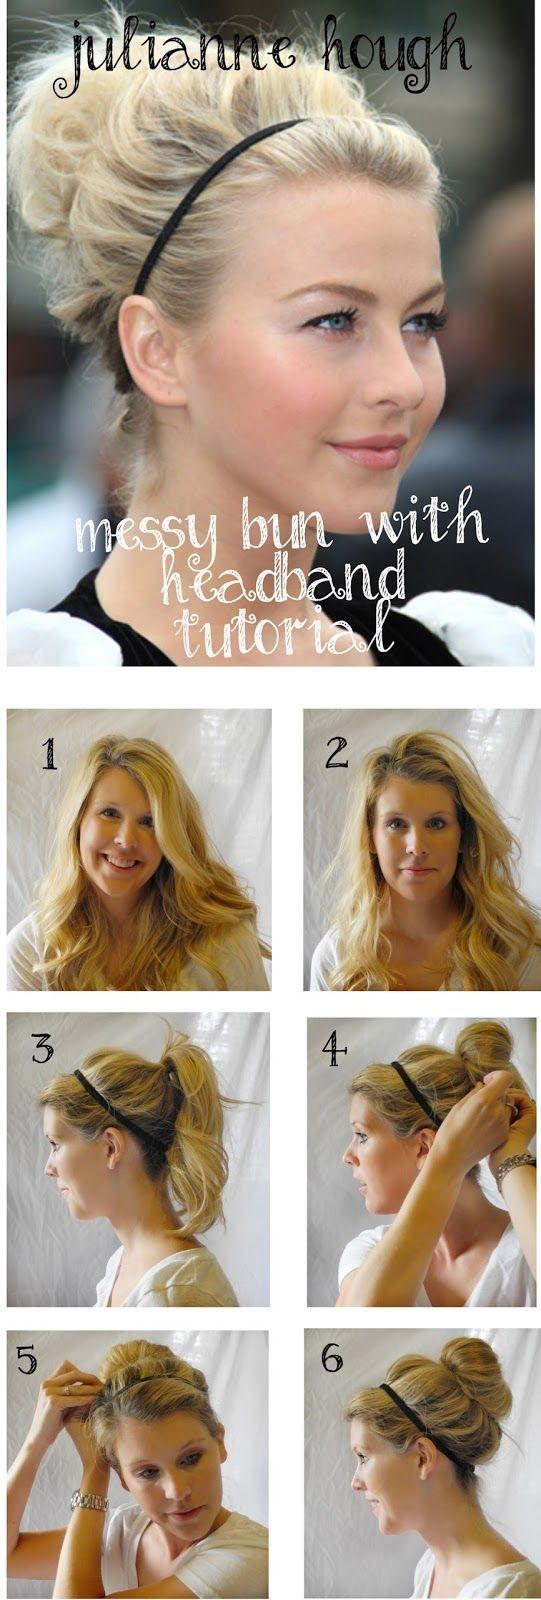 Three sweet peas channelling julianne hough hair tutorial channelling julianne hough hair tutorial baditri Choice Image